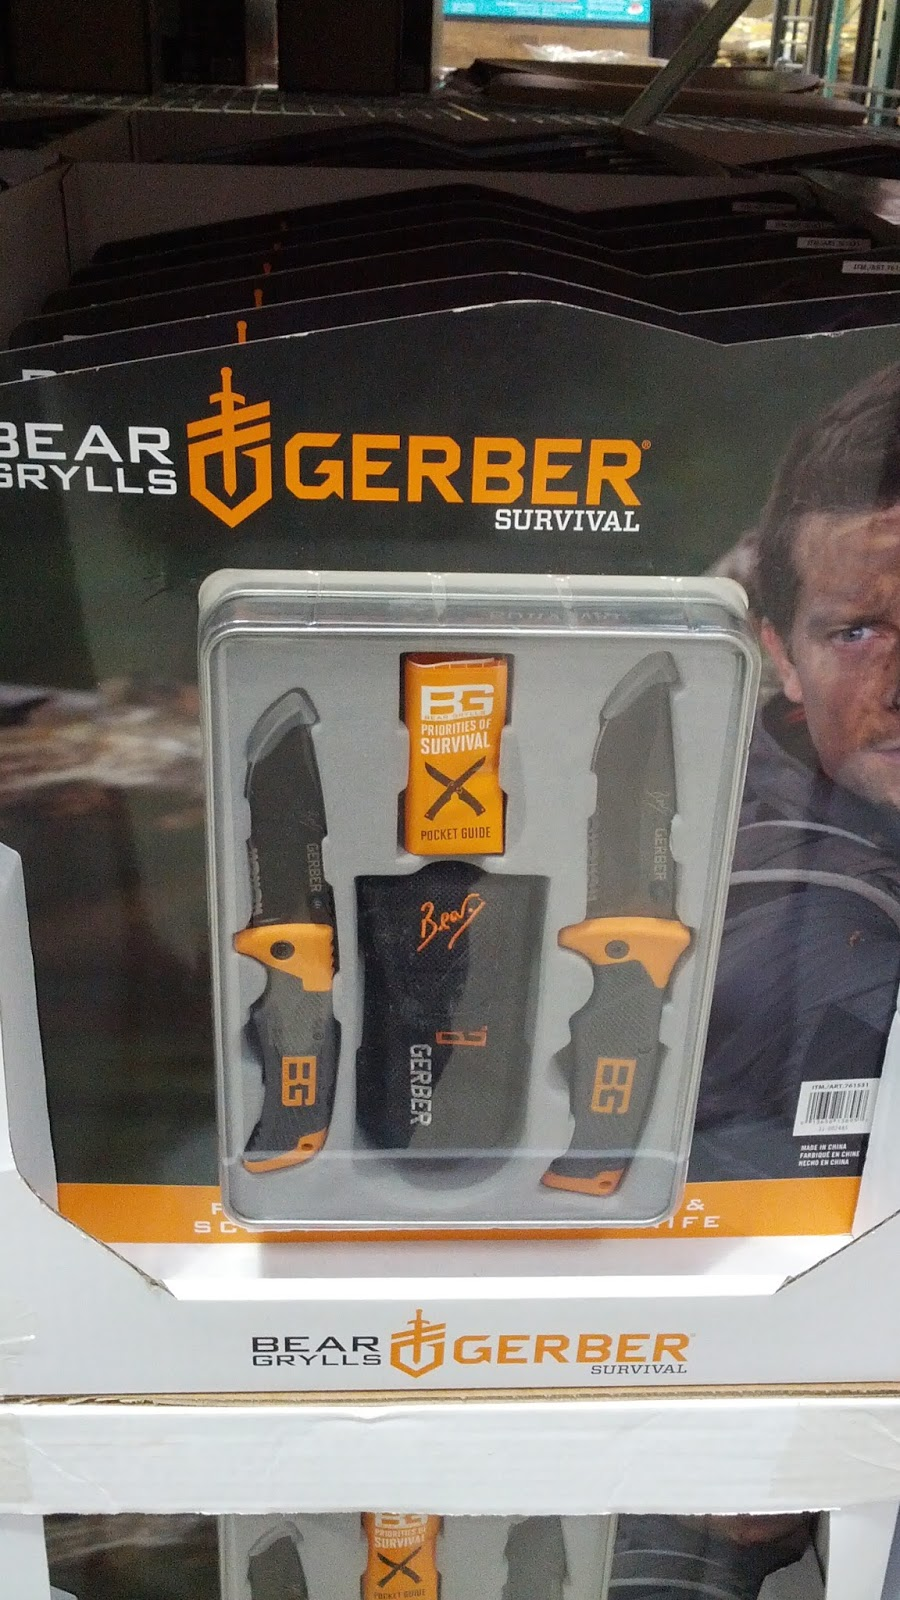 be like bear grylls with the gerber bear grylls survival knife gerber bear grylls 2 piece survival knife set   costco weekender  rh   costcoweekender